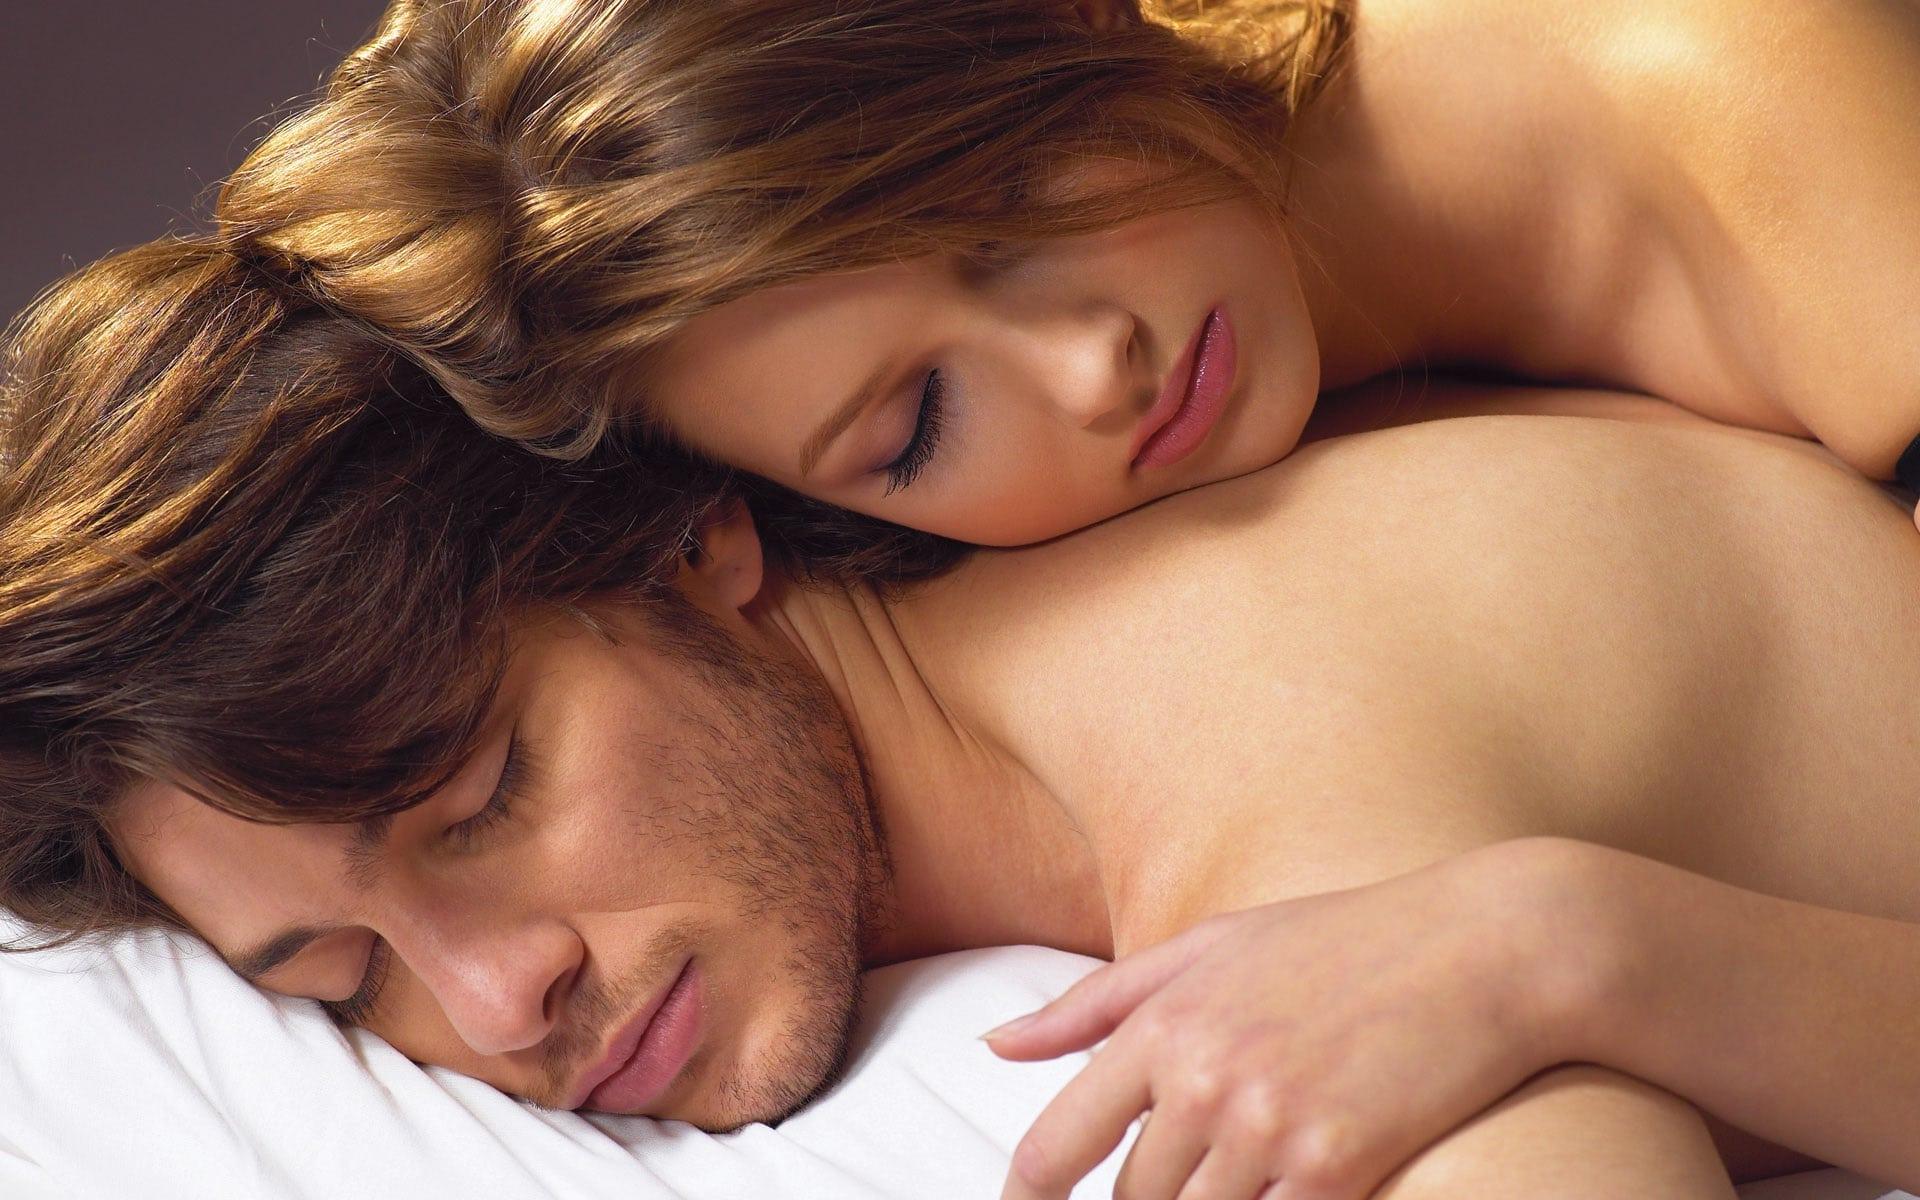 Давай спать картинки романтика, день погранвойск открытки